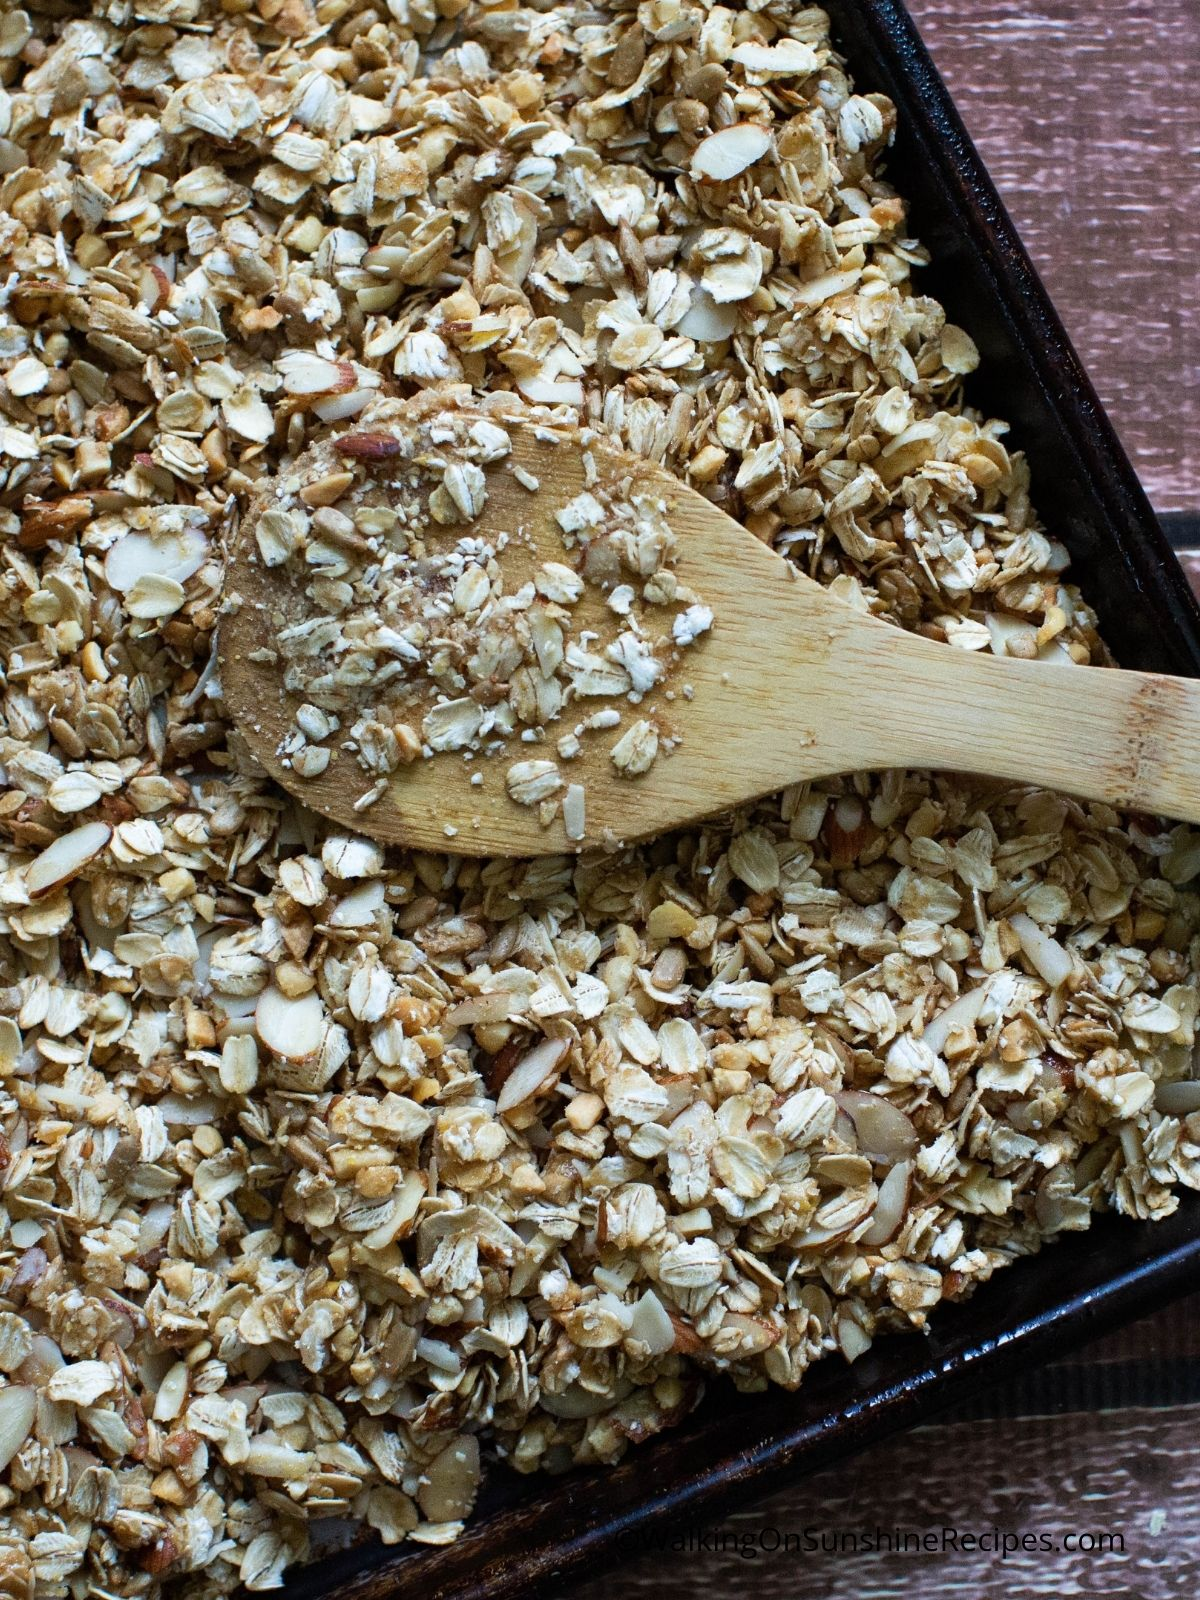 Granola on baking tray before baking.